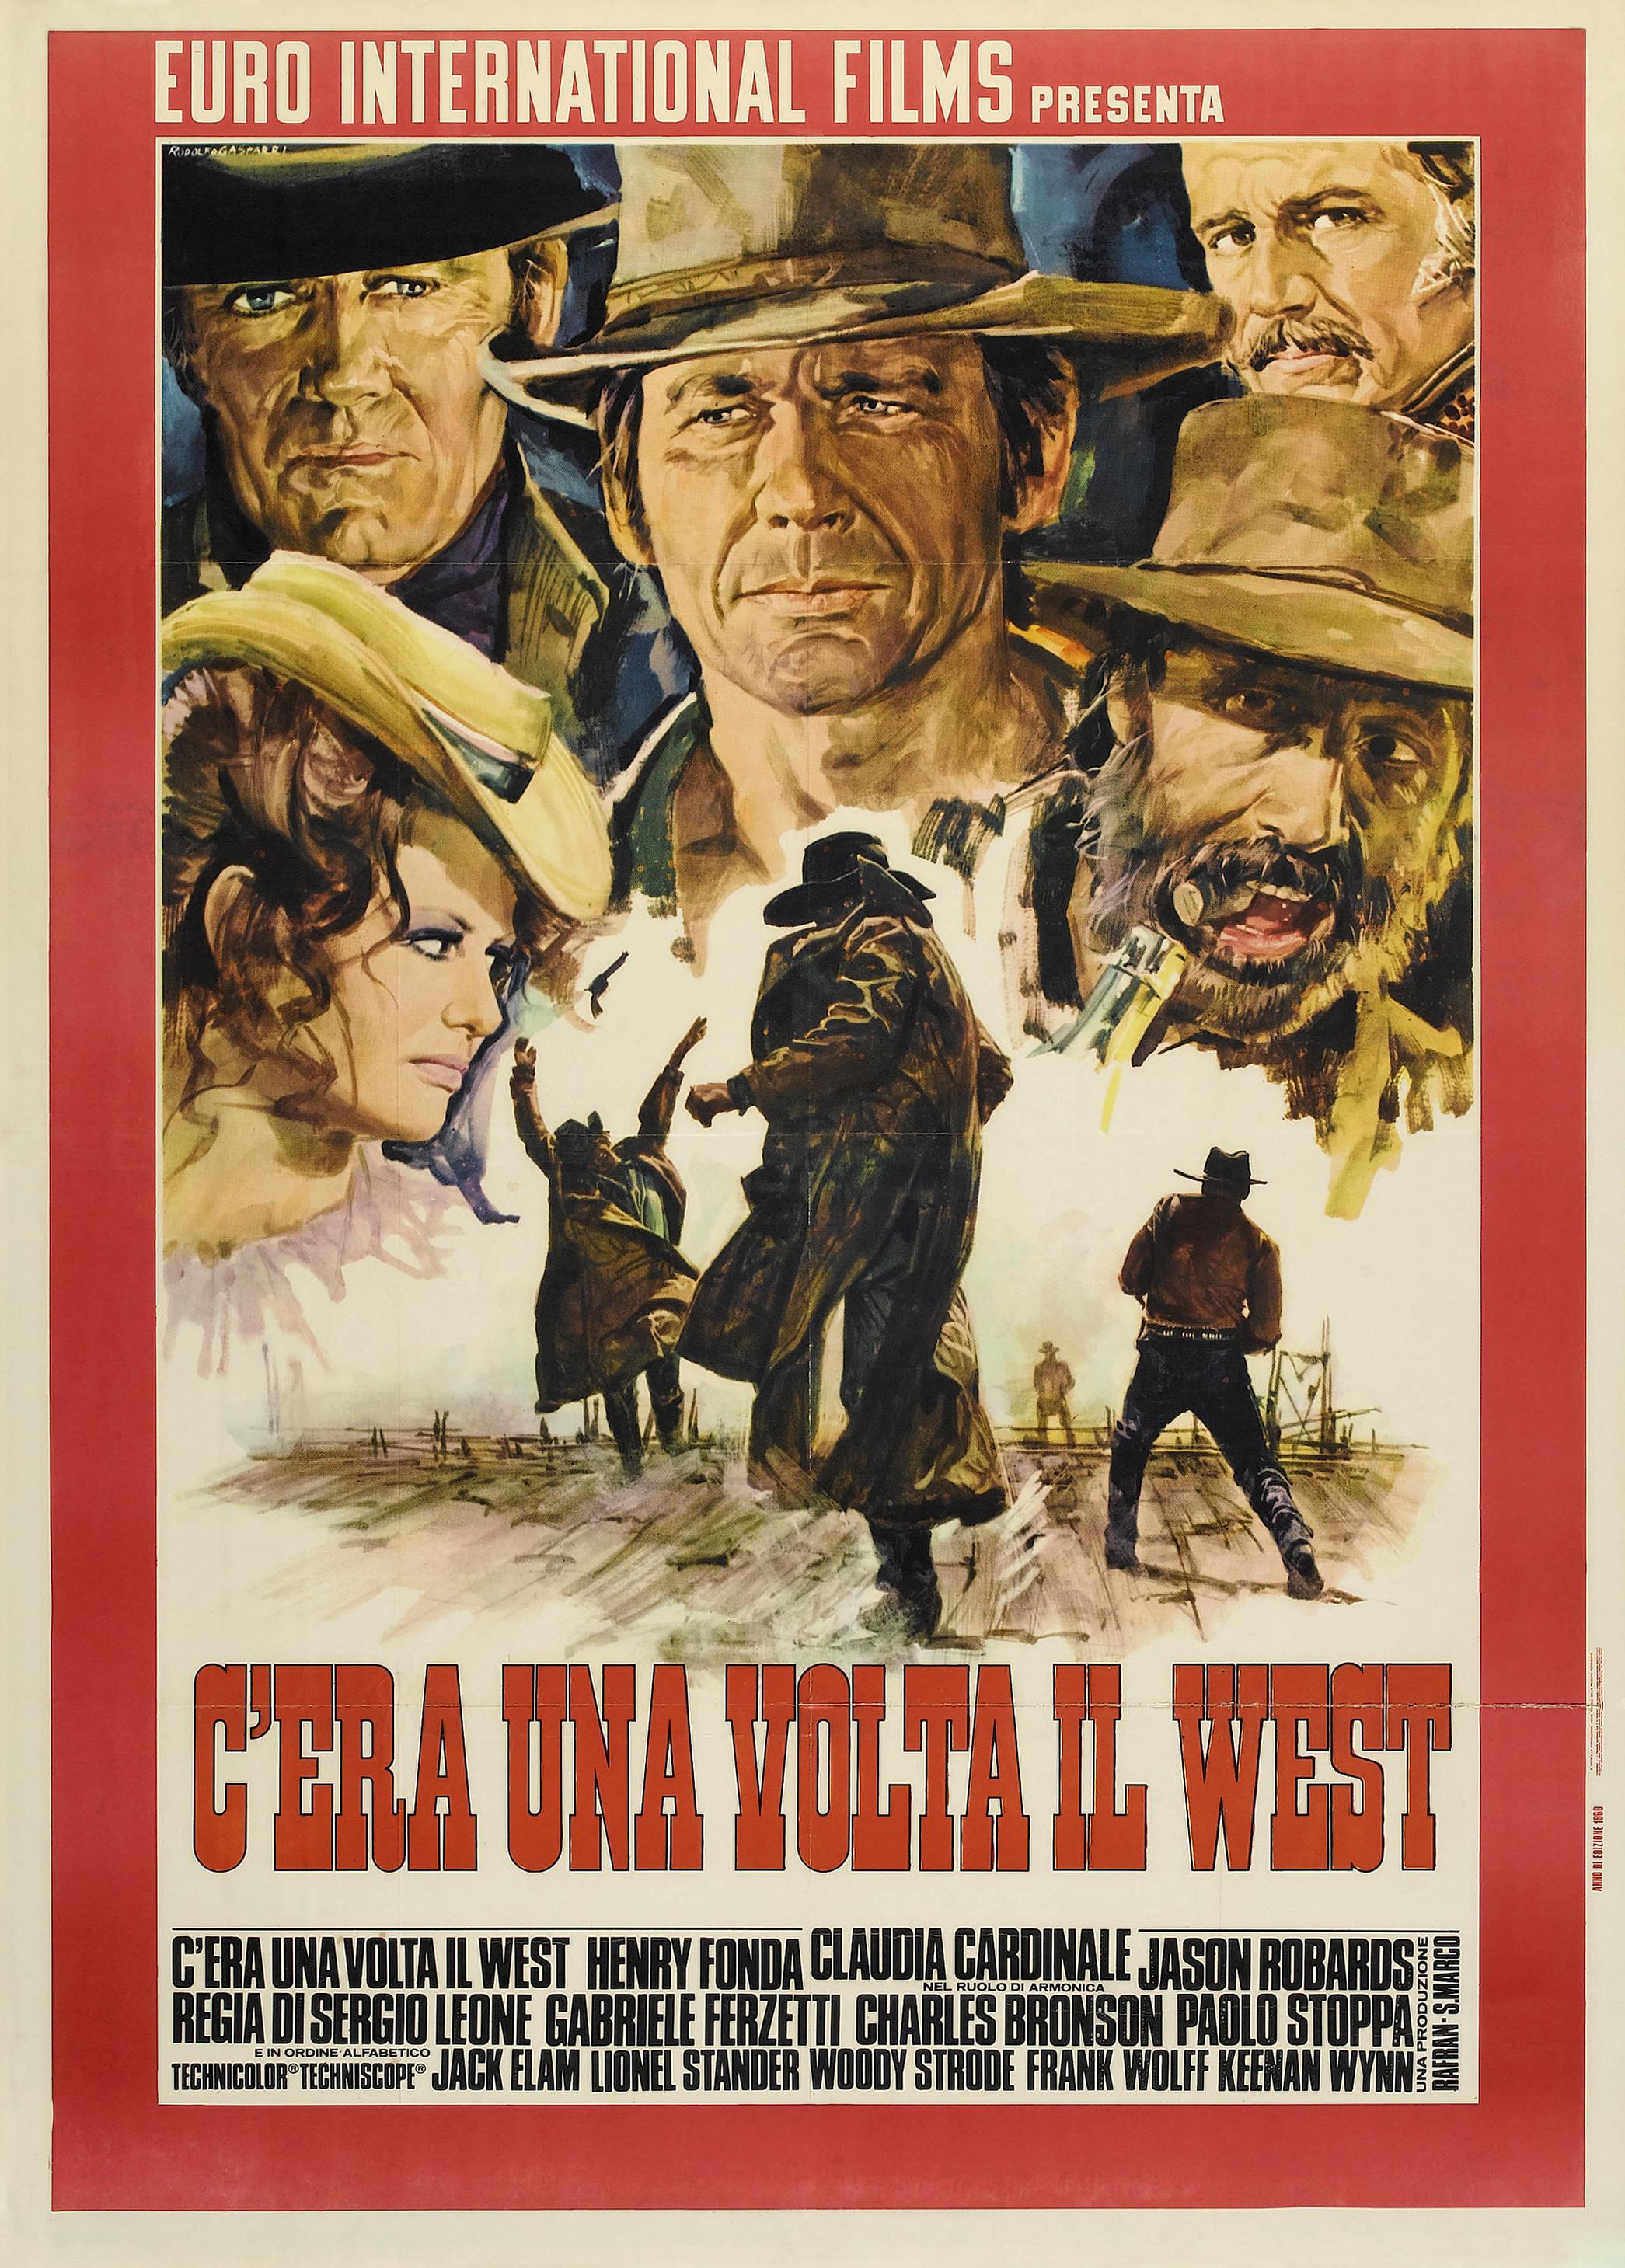 1-cera-una-volta-il-west